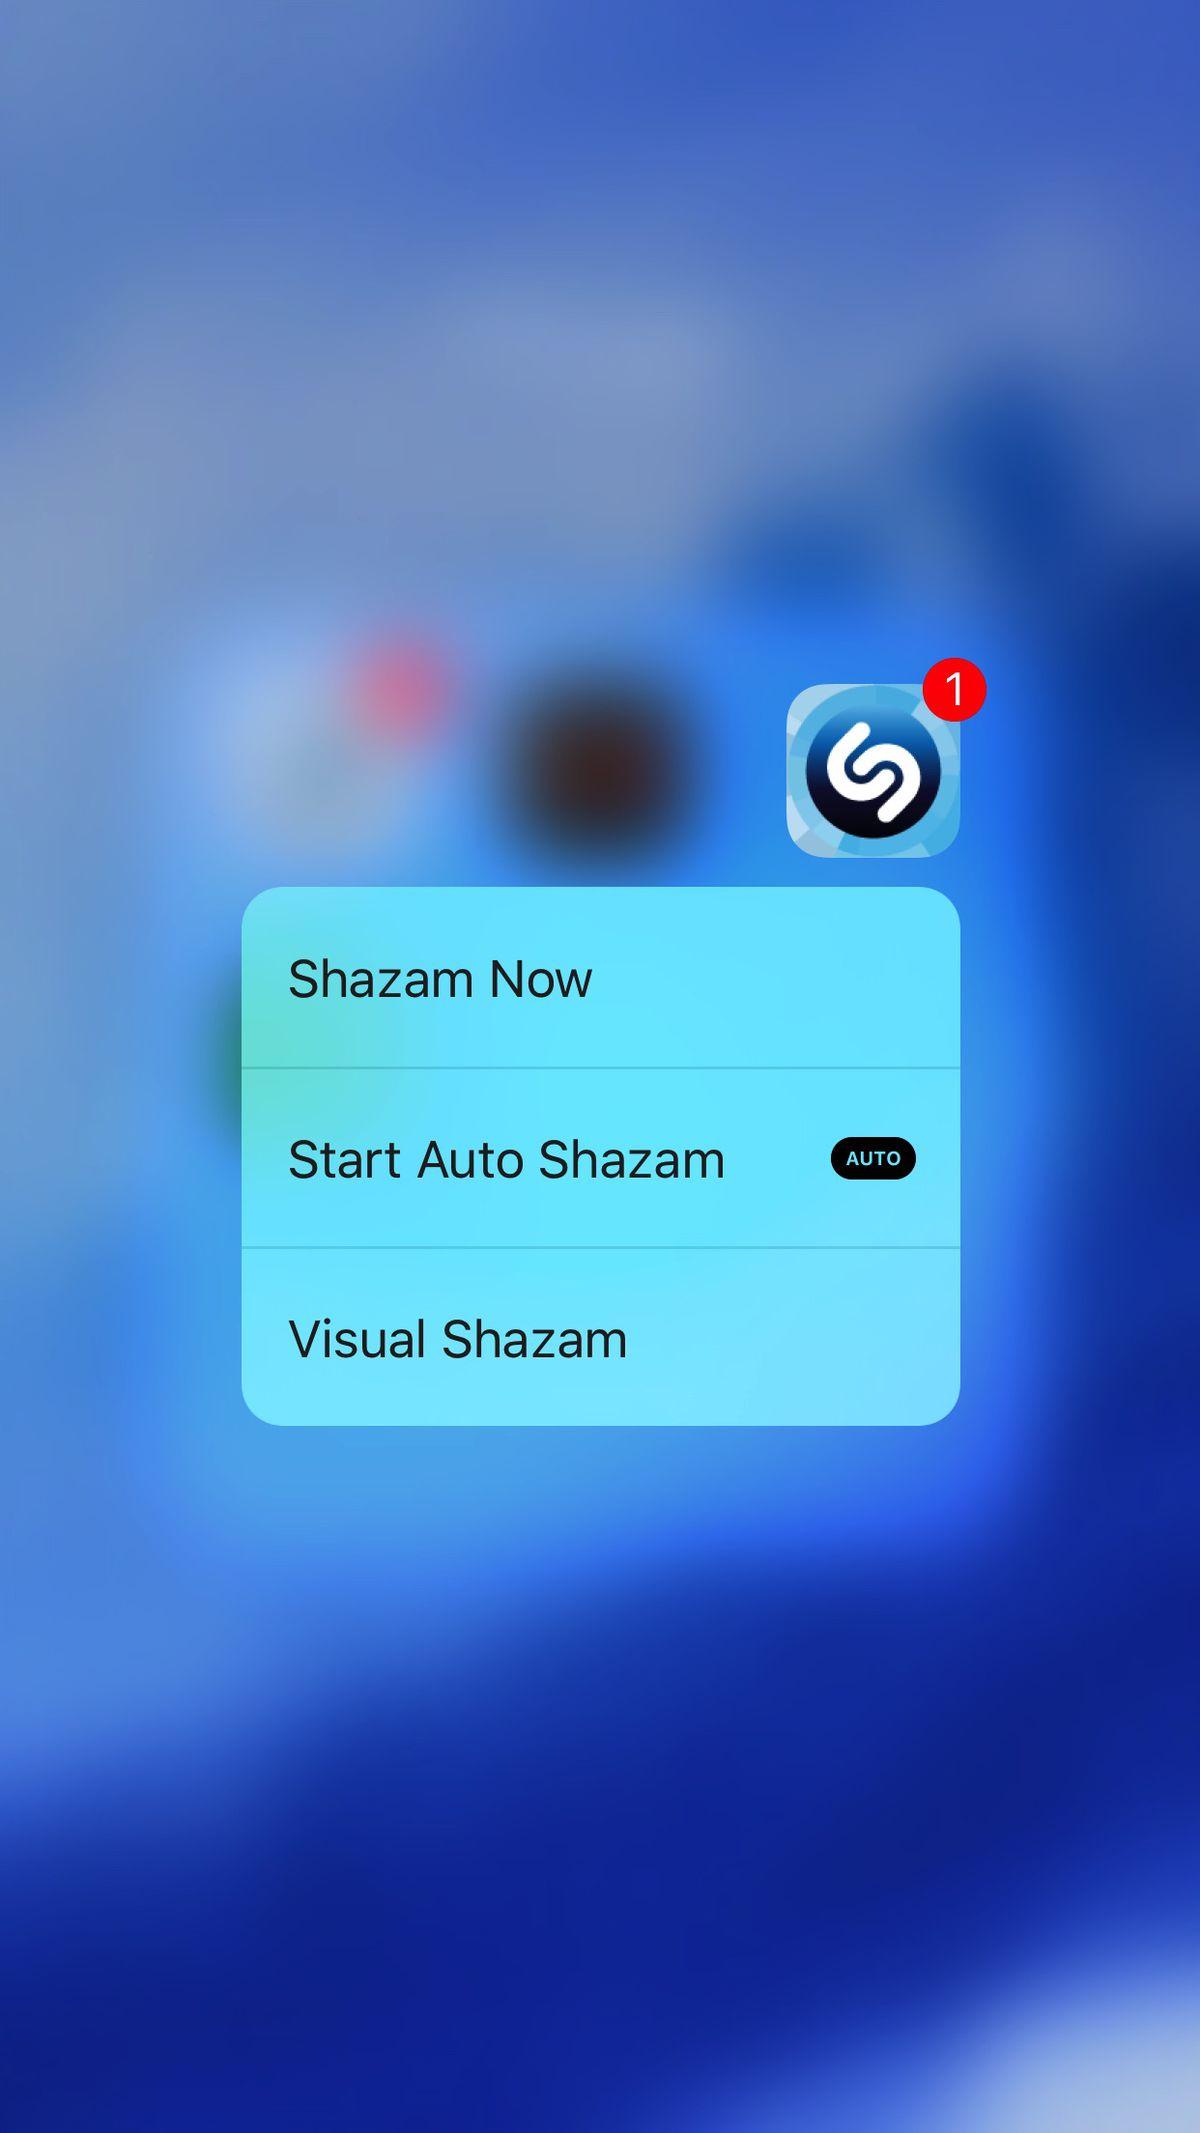 3D Touch Shazam